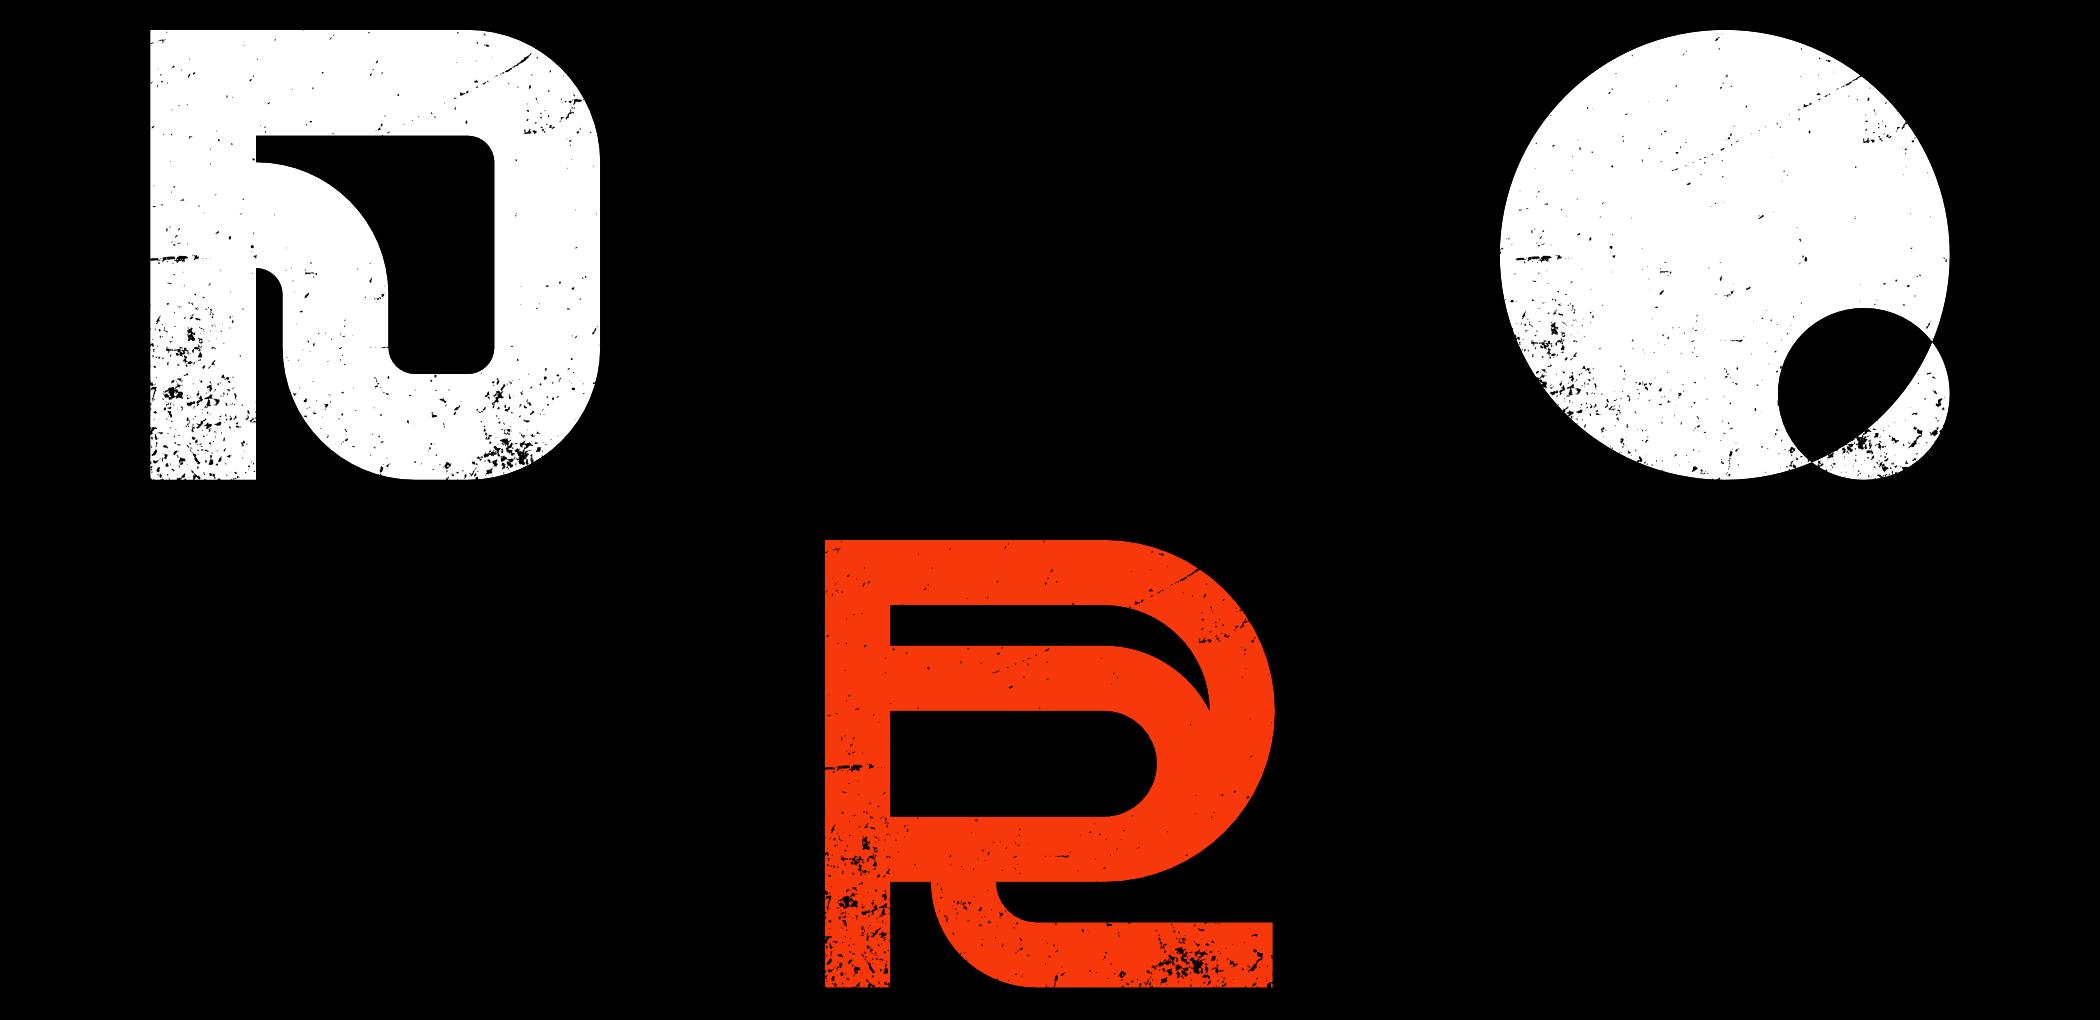 36DaysofType - P,Q,R